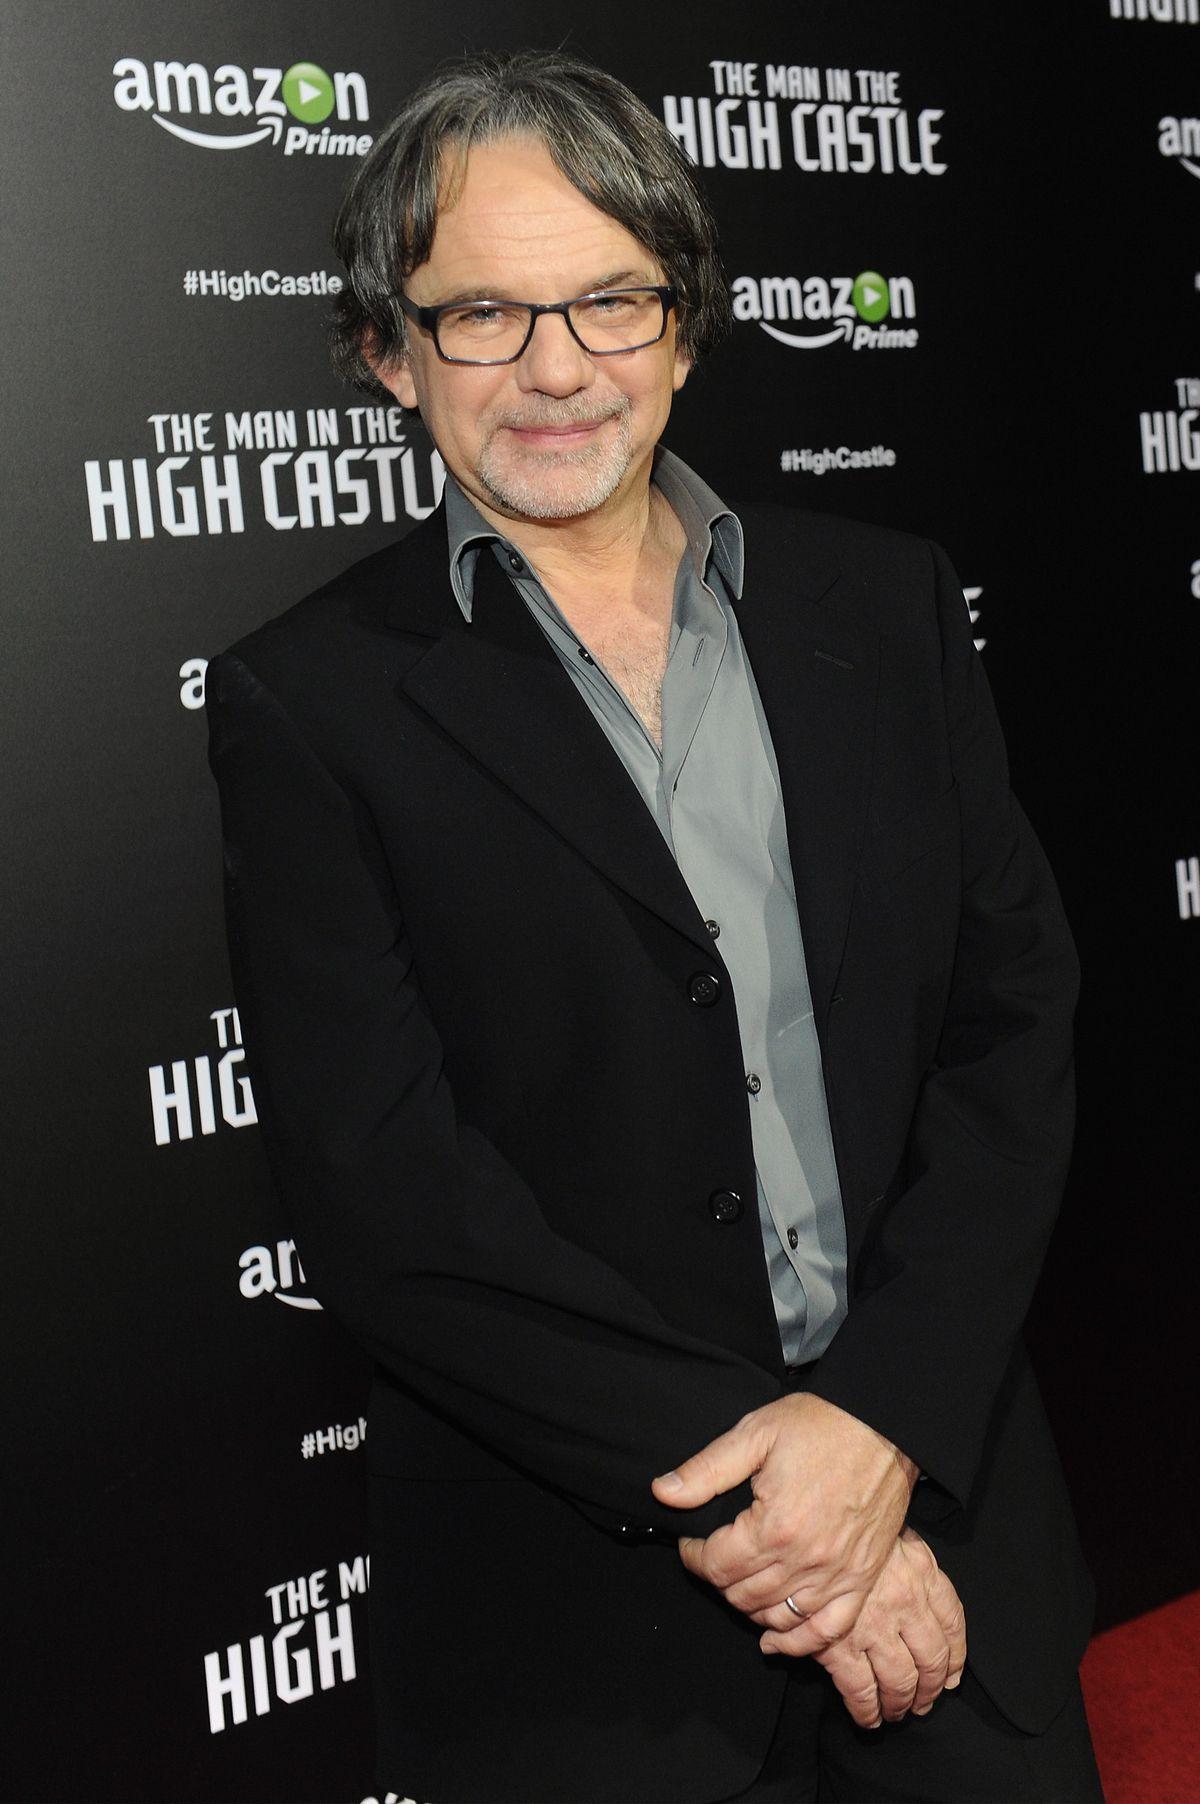 NY Premiere Of Amazon Original's 'Man In The High Castle'